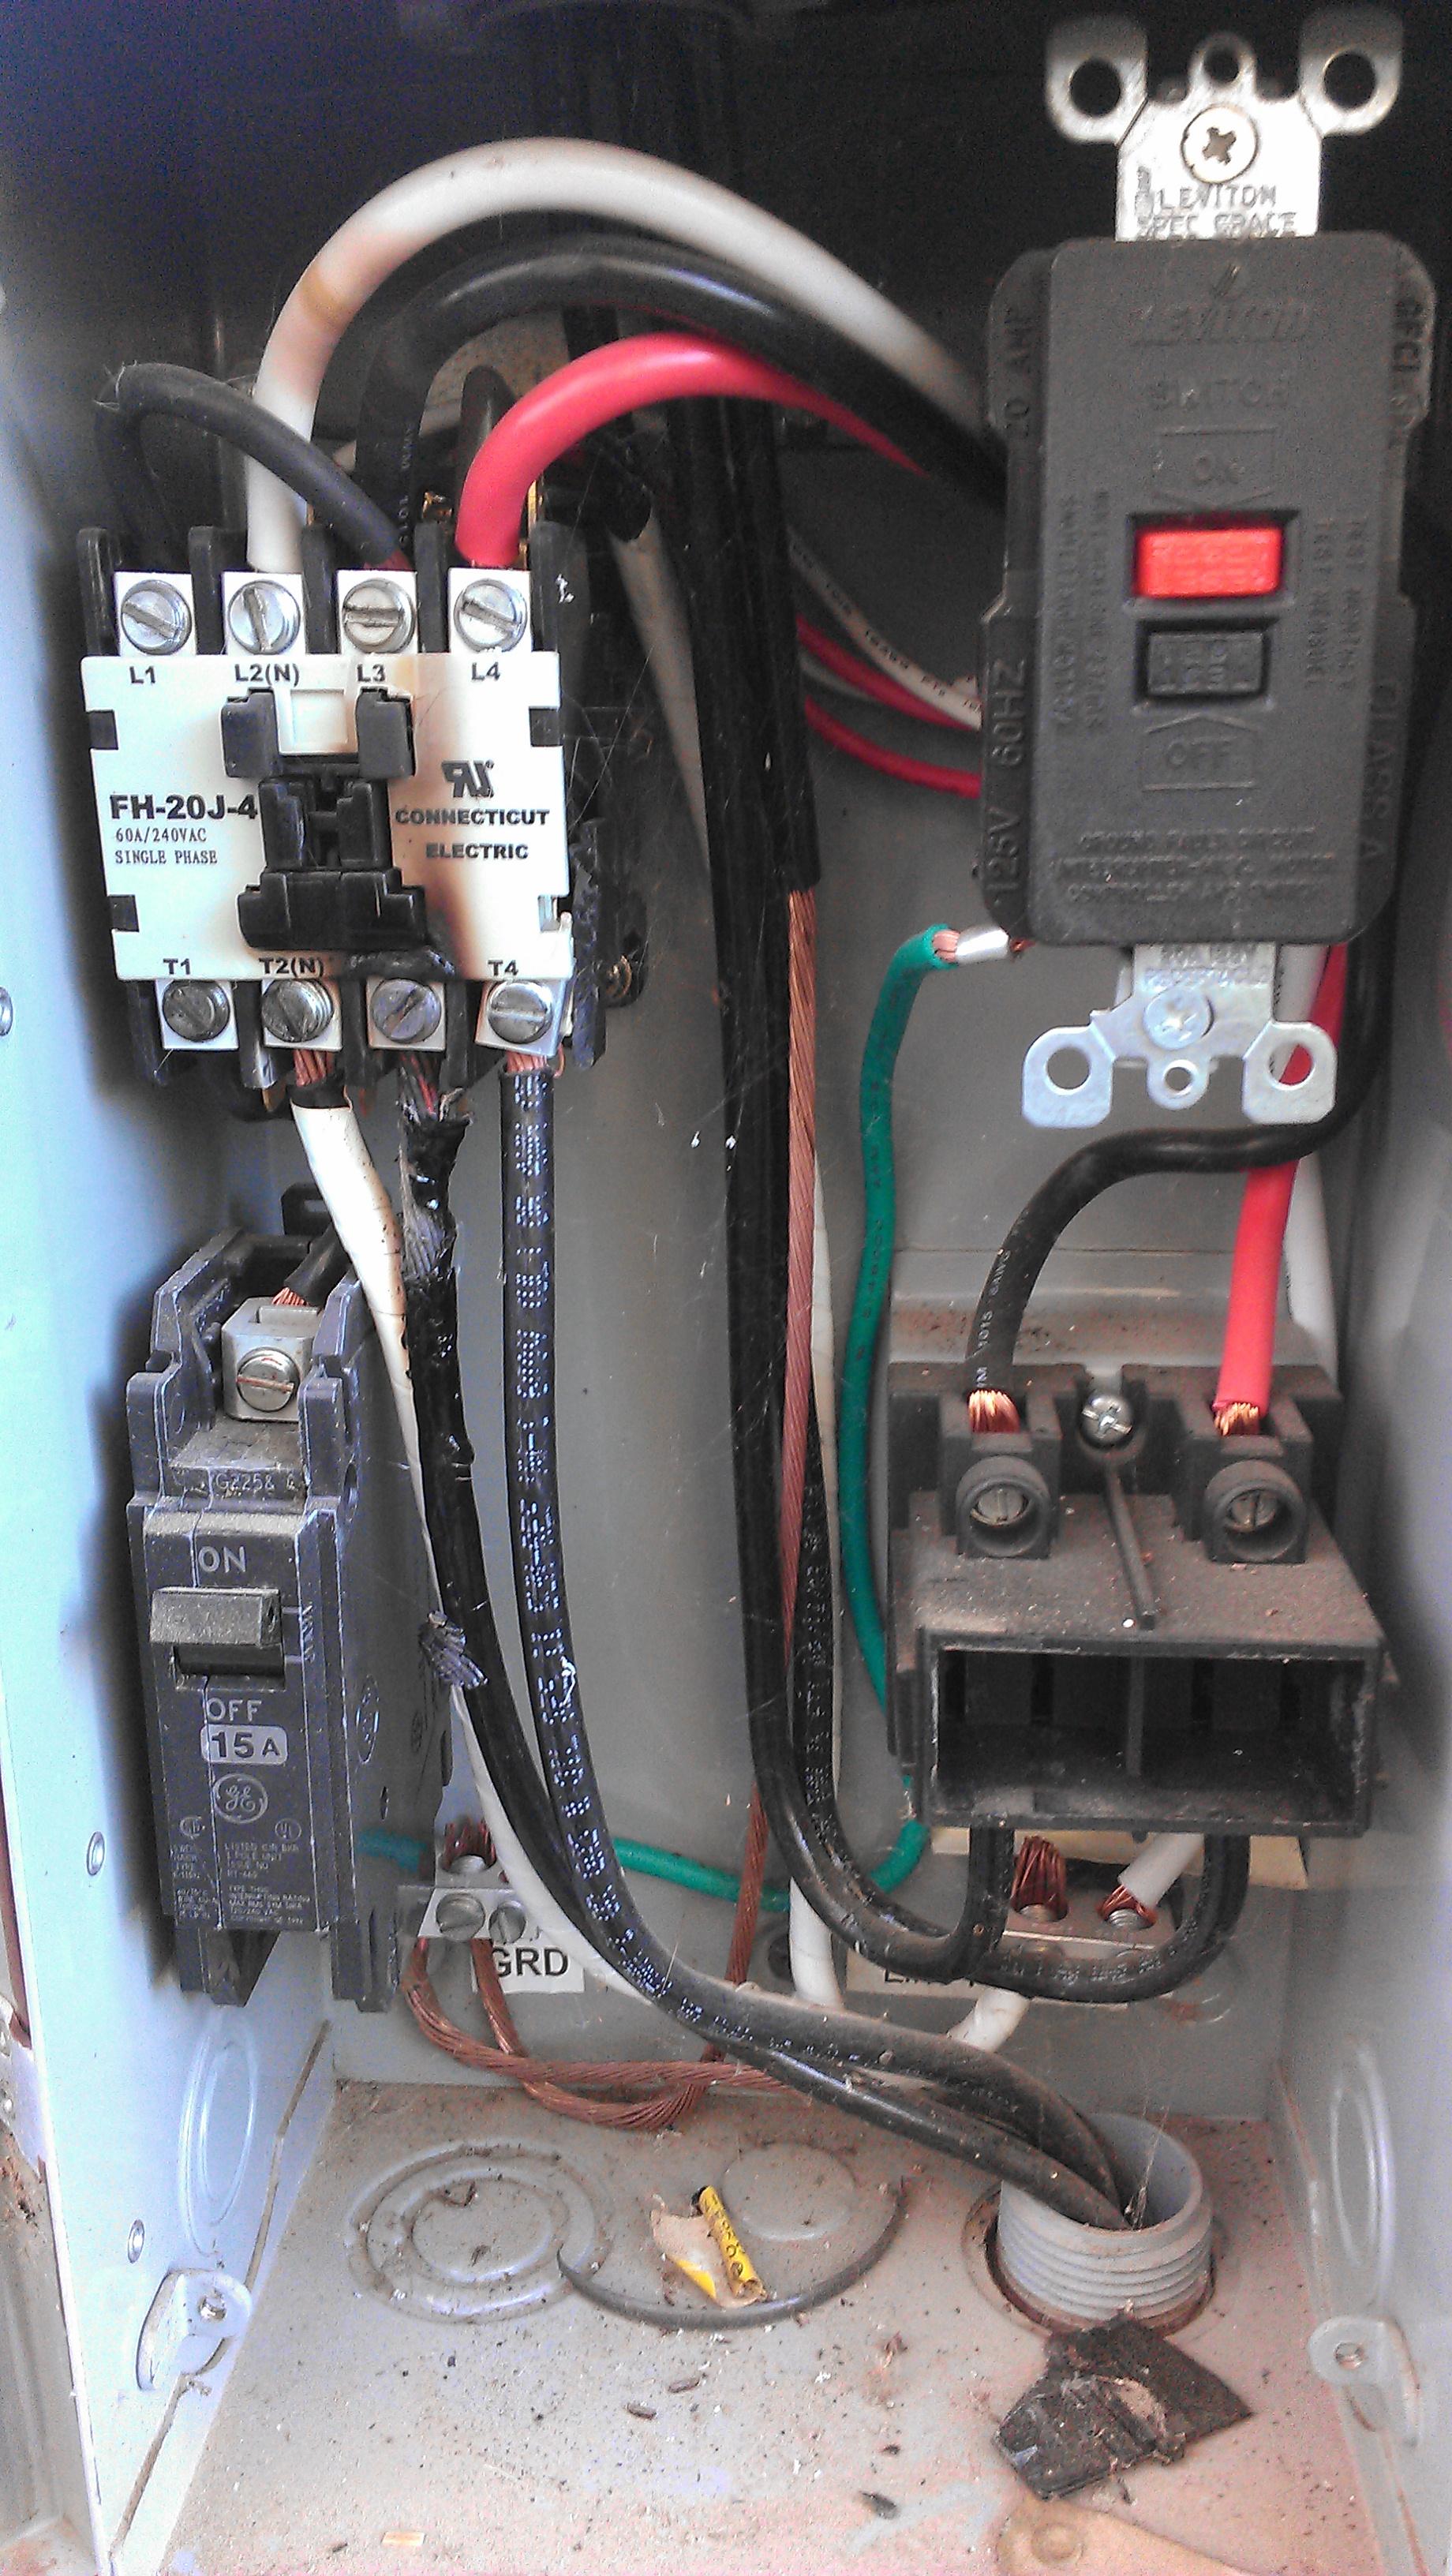 Wiring Hot Tub Breaker